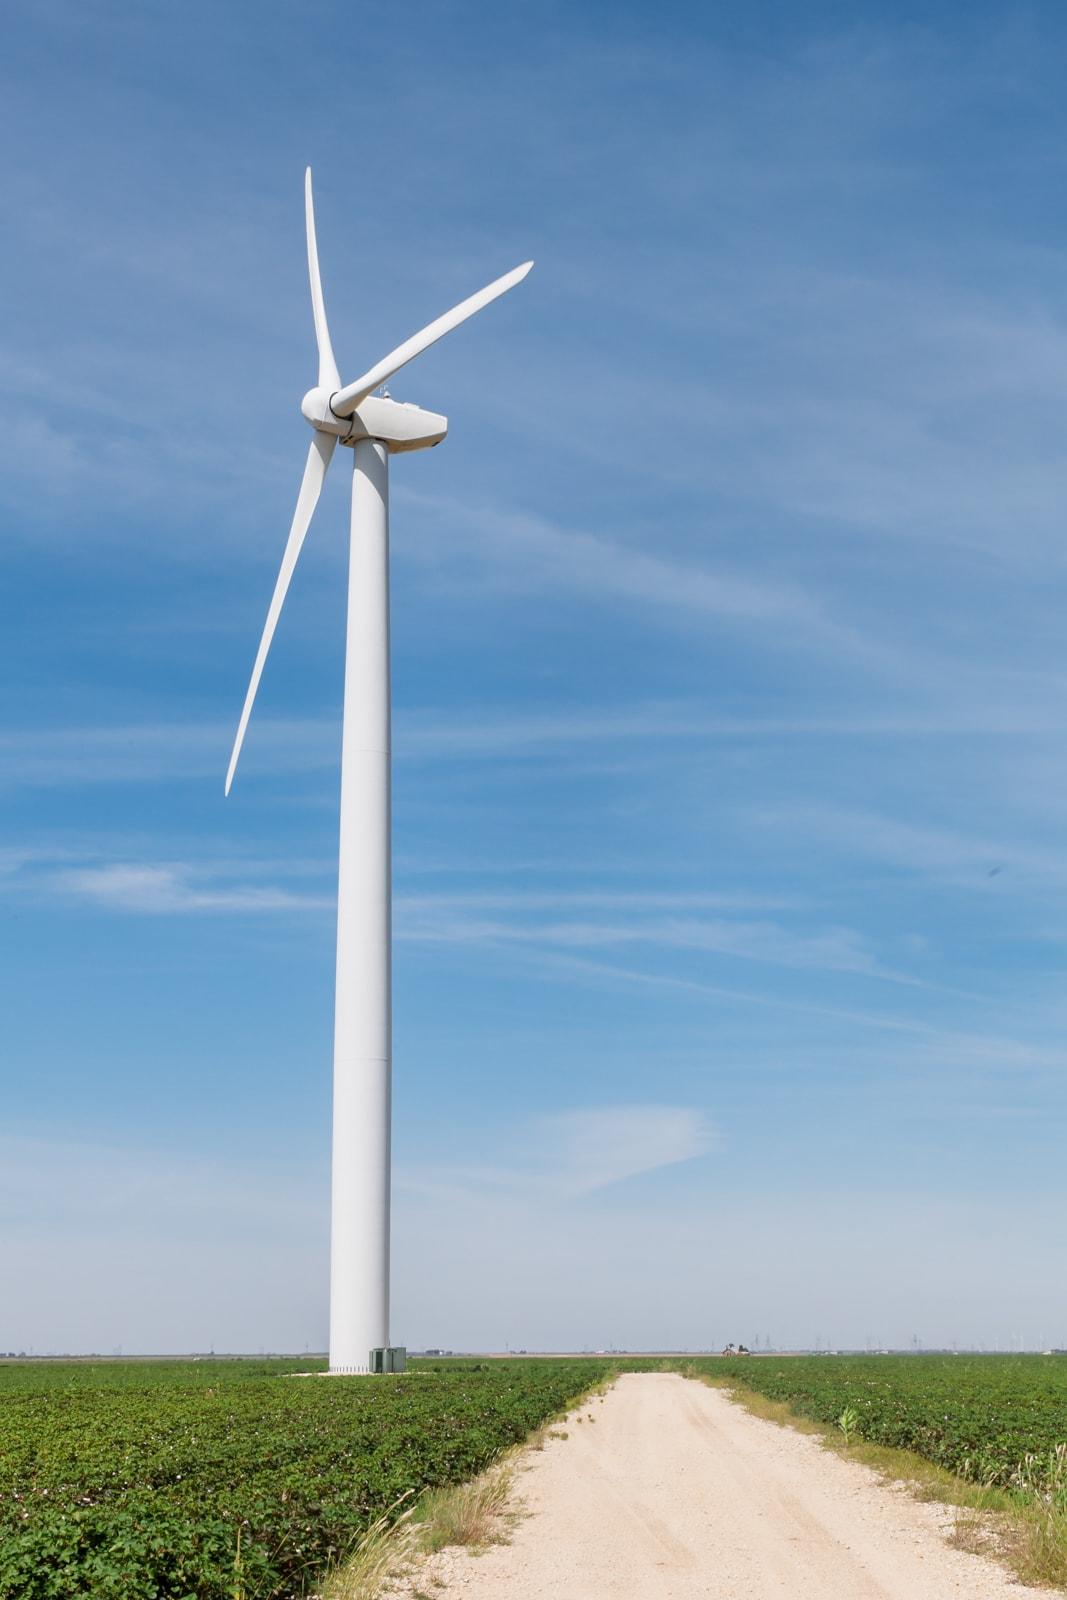 A wind turbine on a dirt road at the Roscoe Wind Farm